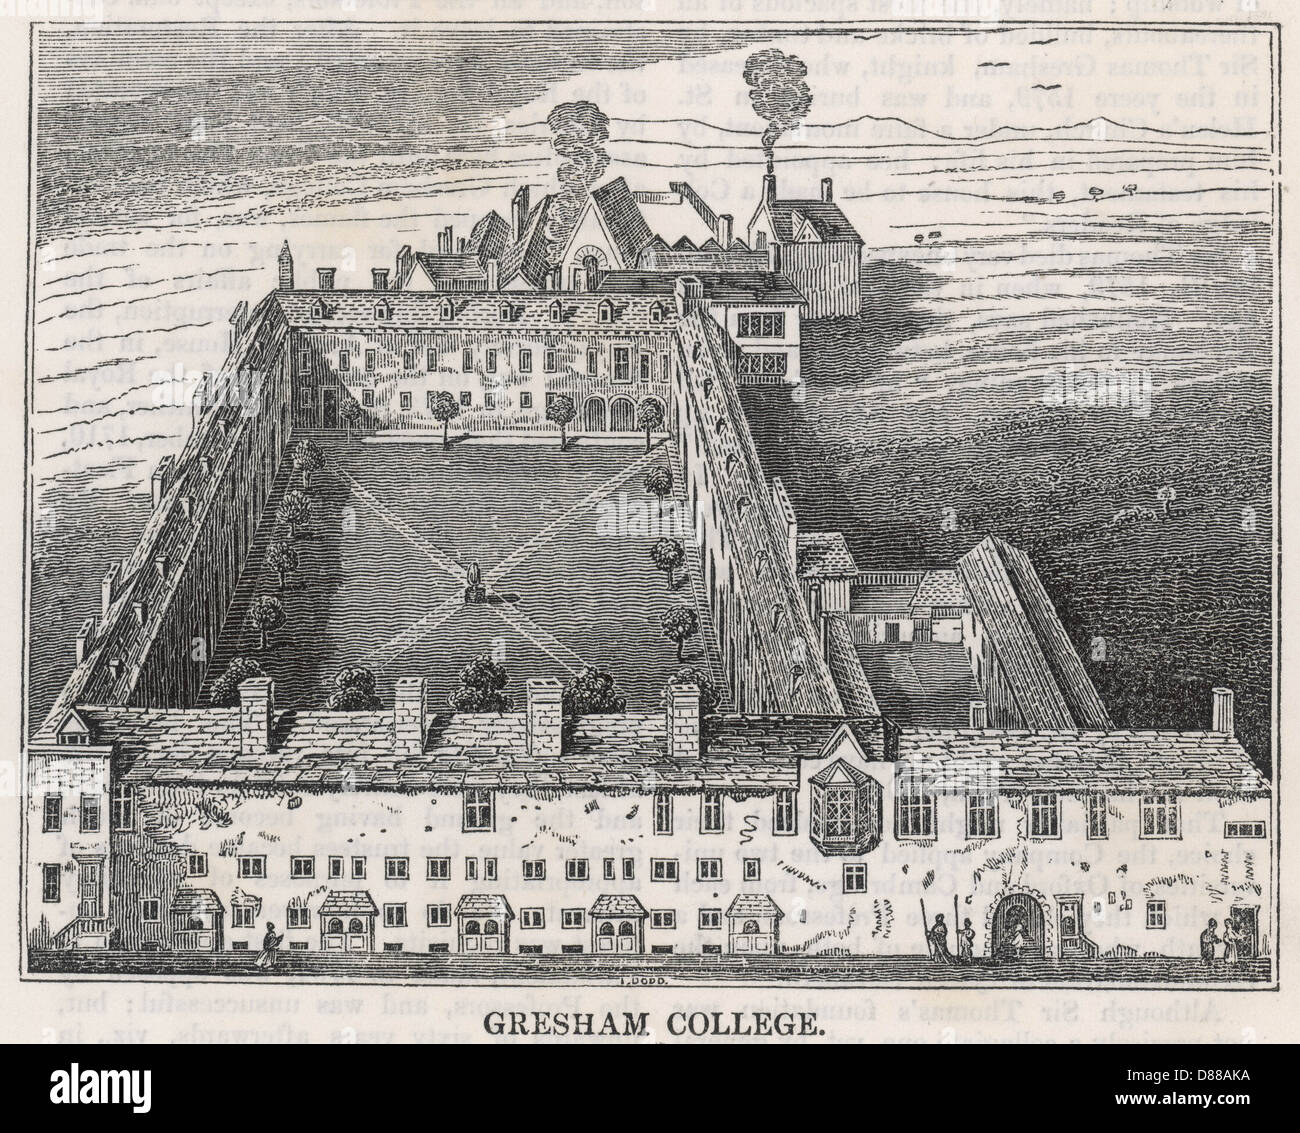 Gresham College 1834 - Stock Image